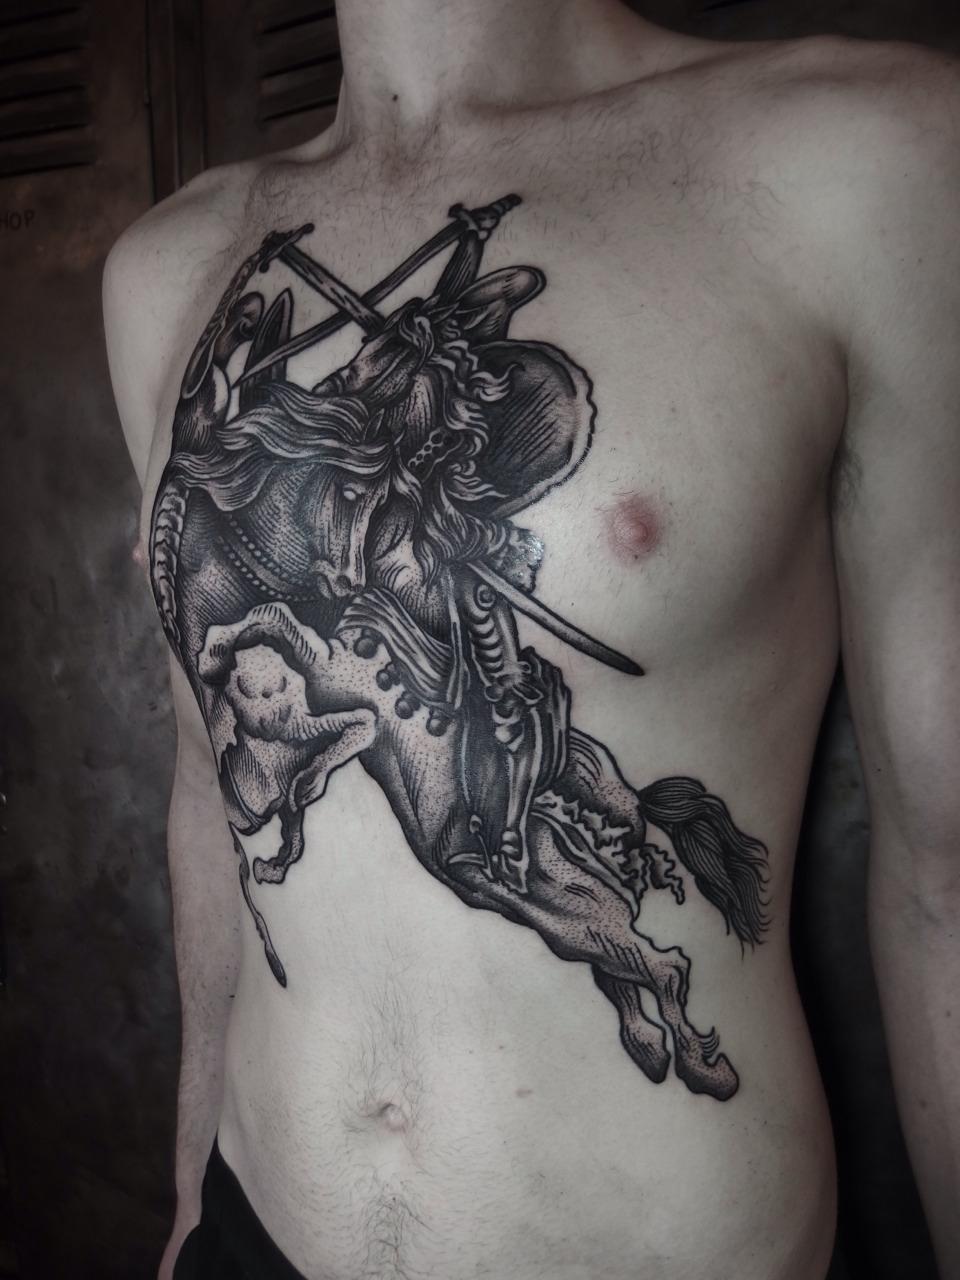 5423e888b3660rafael_delalande-200514-sqm-tattoo-025.jpg